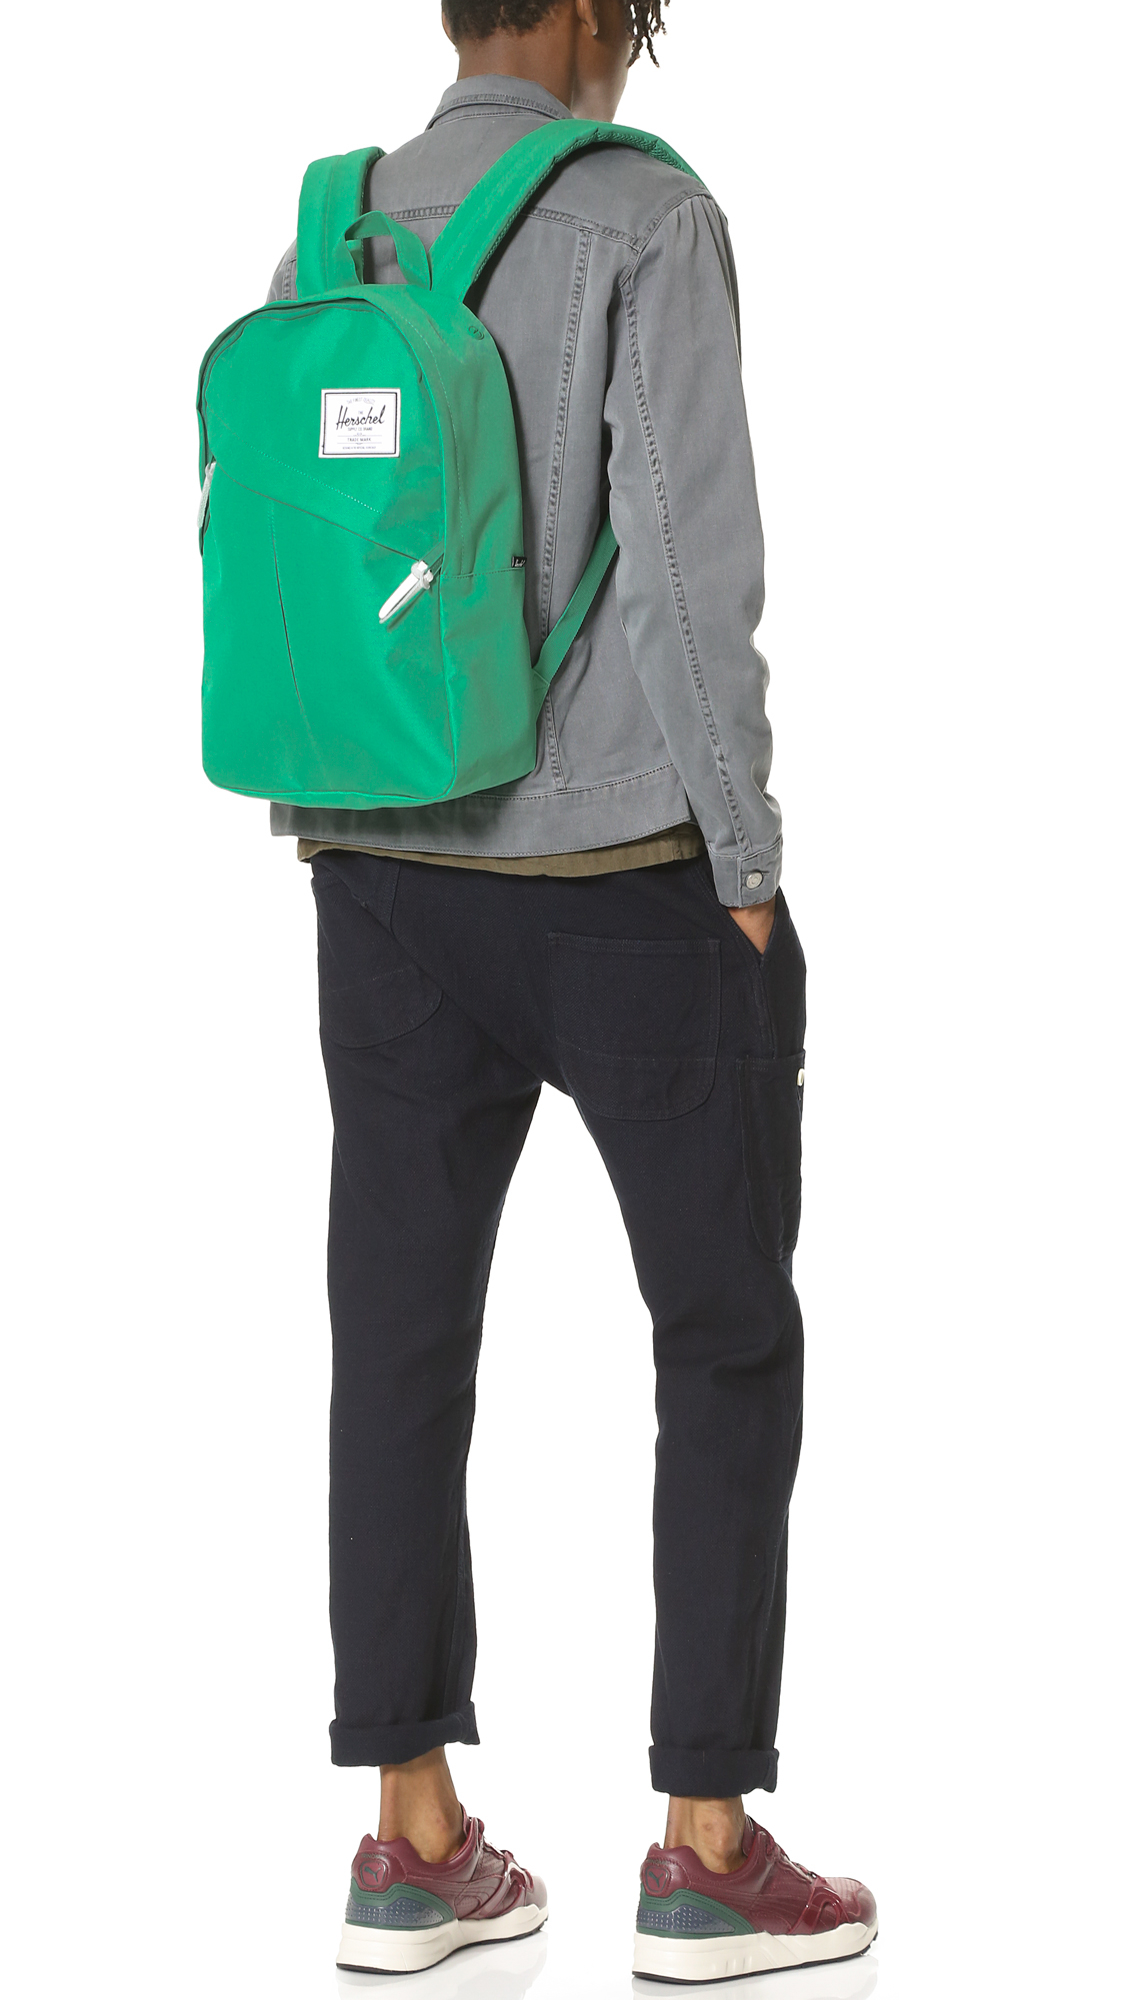 ff6e9d087b8 Lyst - Herschel Supply Co. Parker Backpack in Green for Men